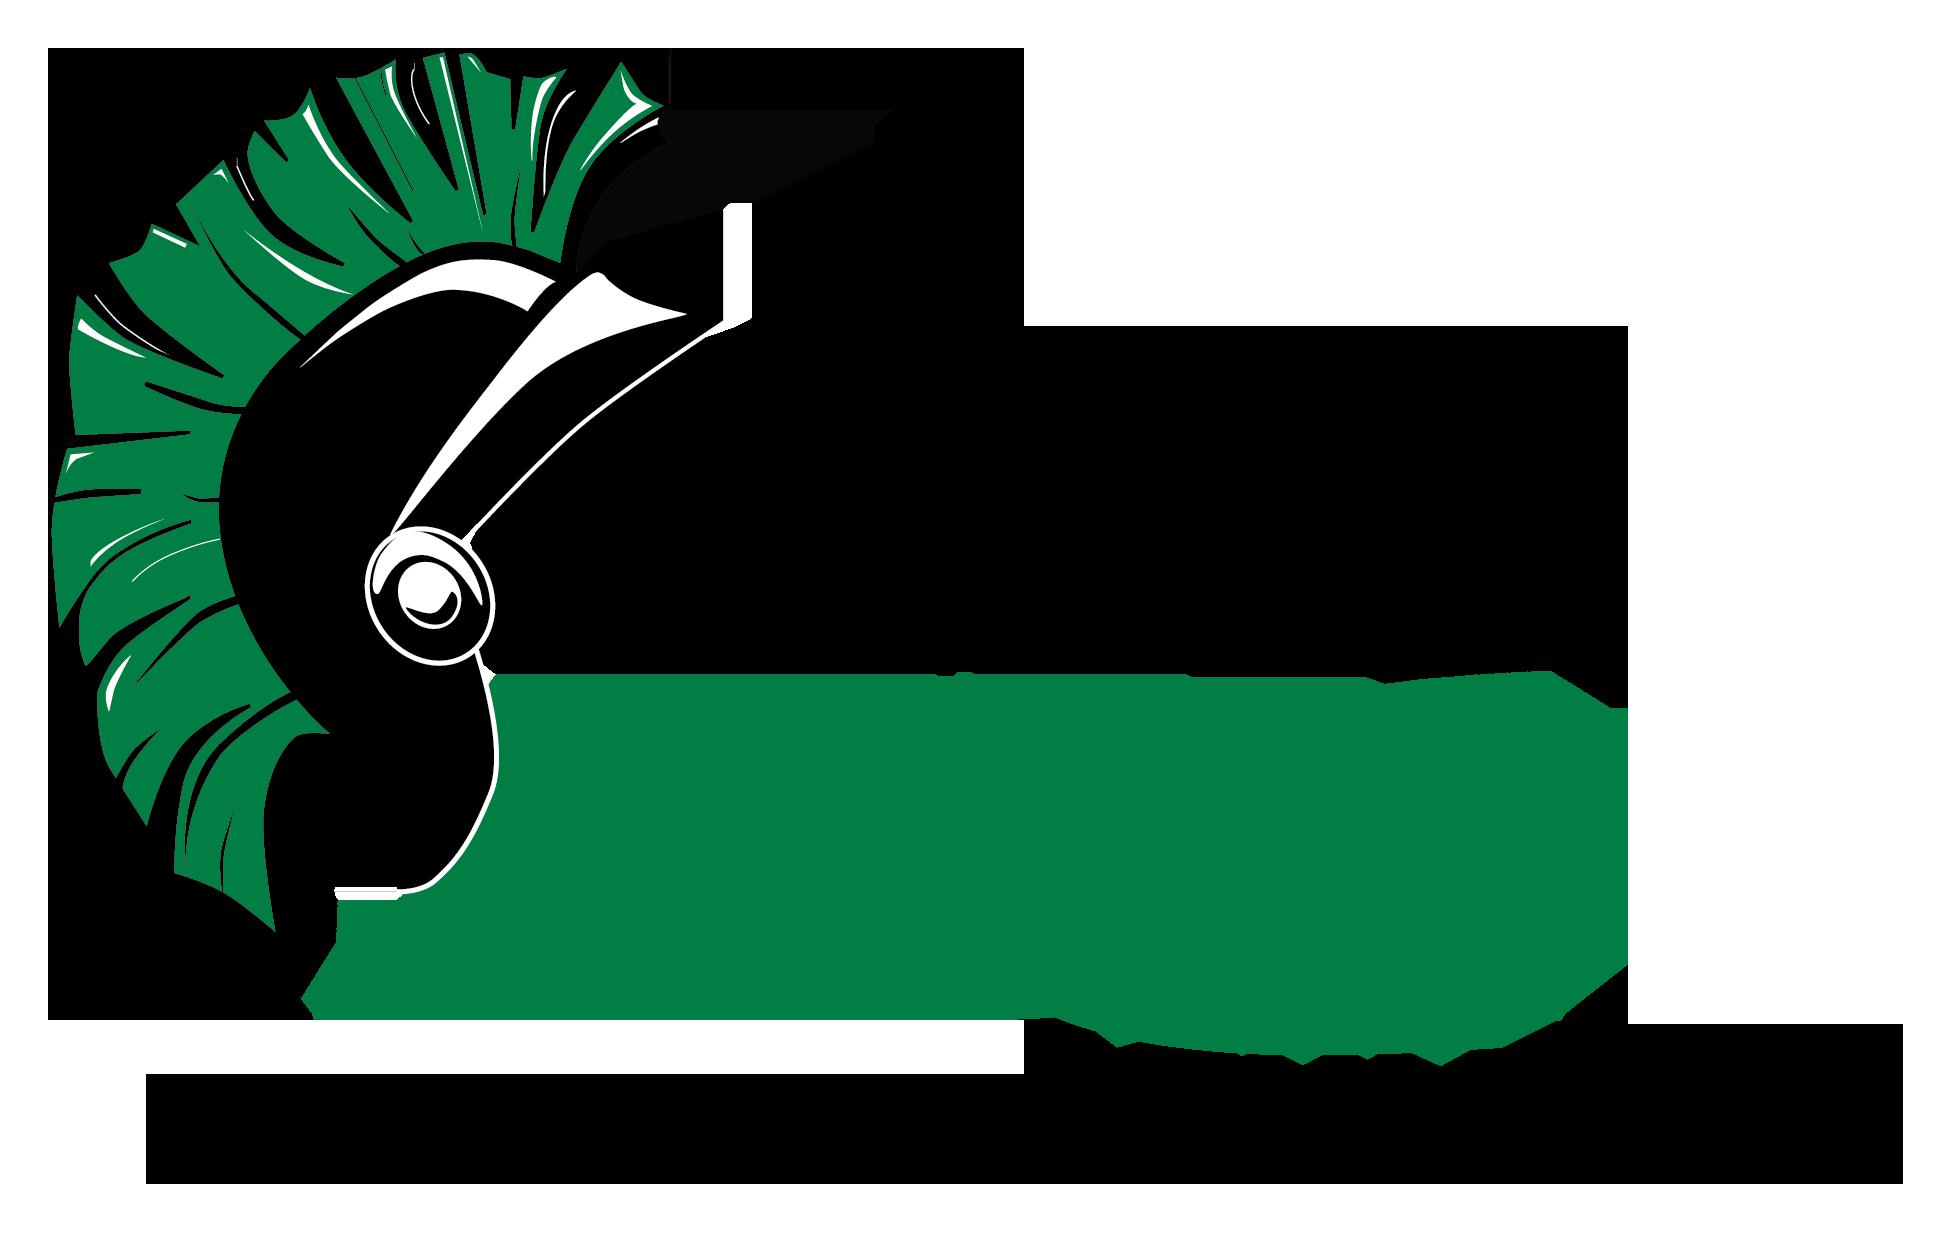 The image of the Warrior Athletics logo.